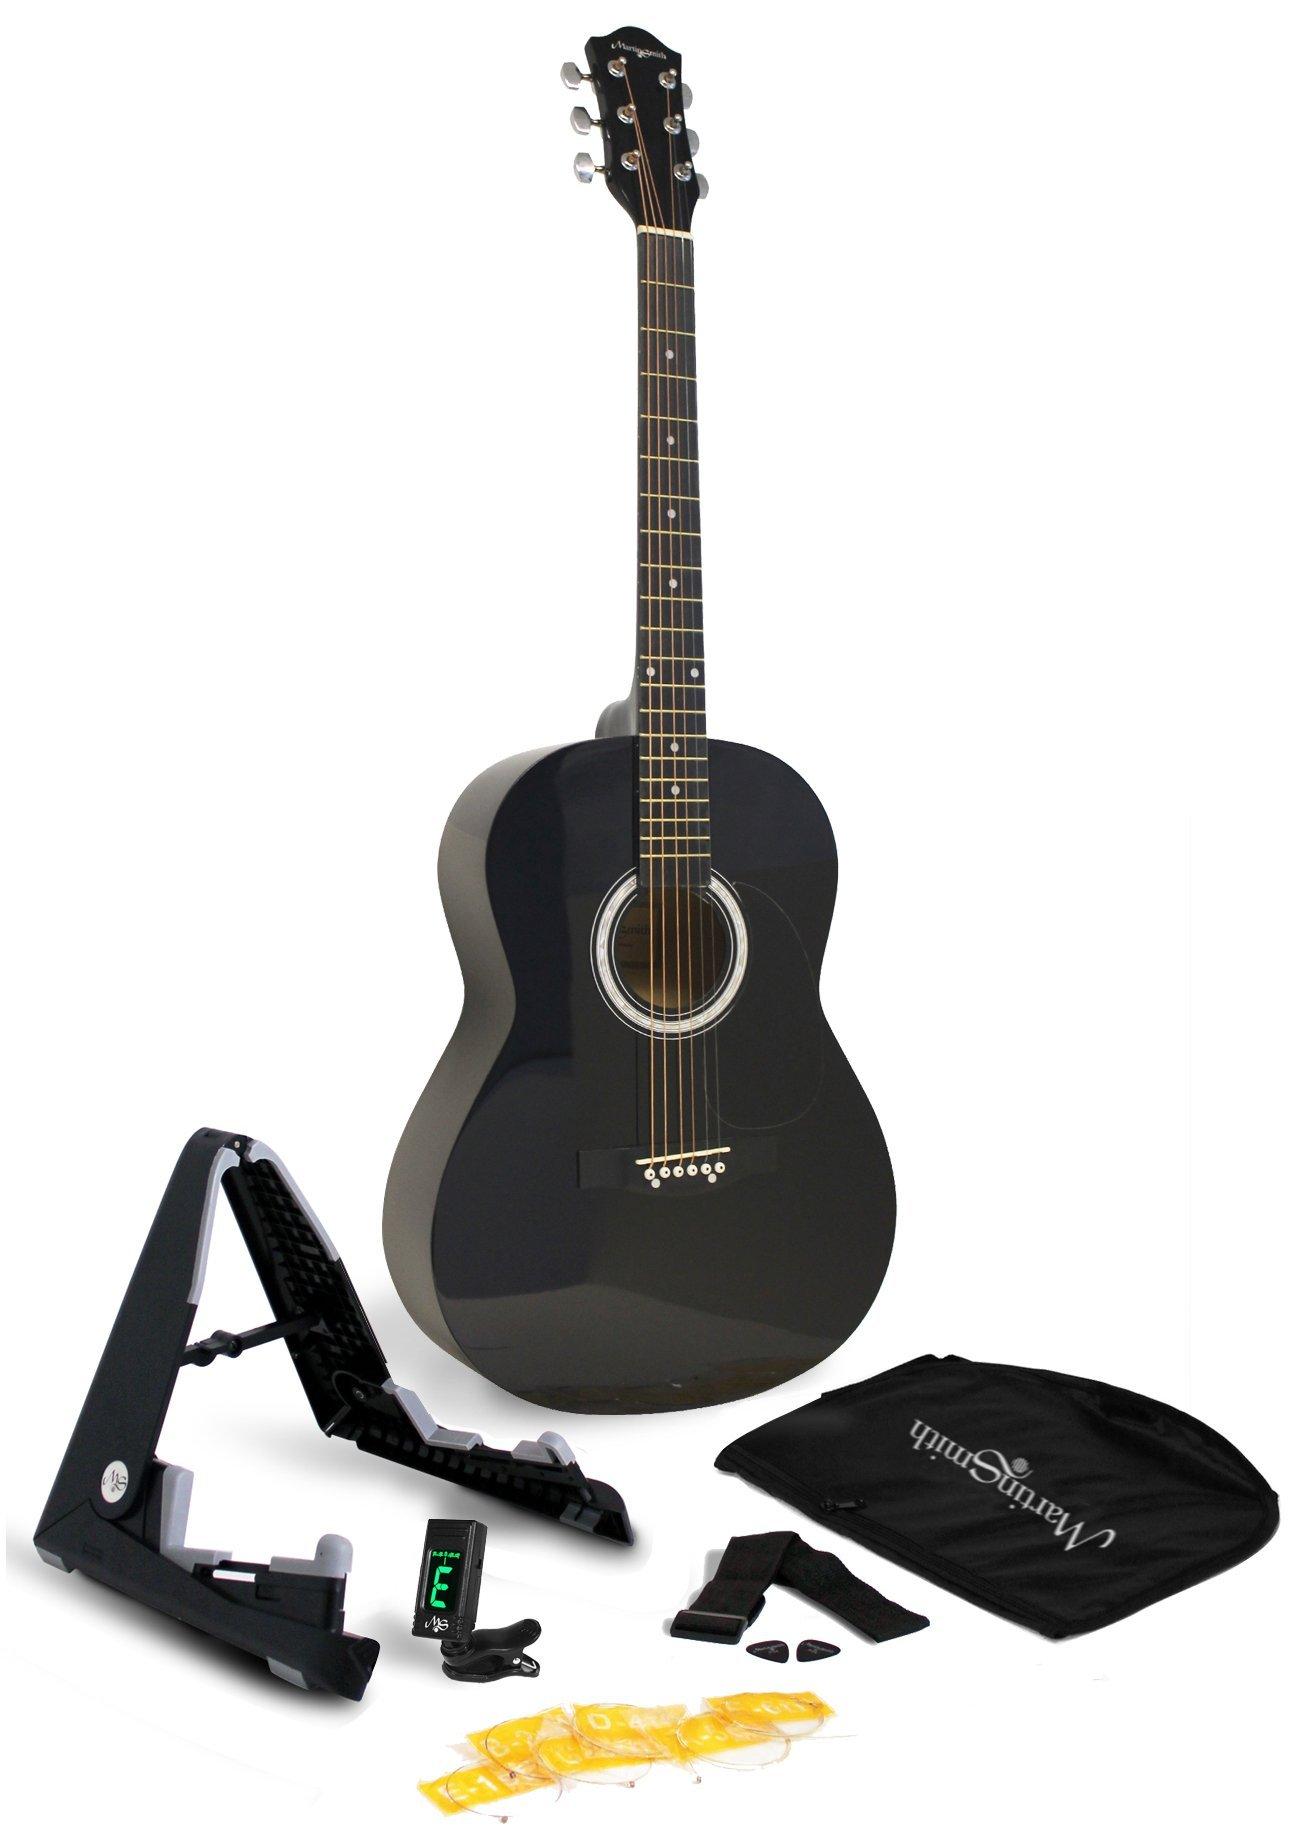 Martin Smith 6 Acoustic SuperKit Stand, Tuner, Bag, Strap, Picks, and Guitar Strings, Black (W-101-BK-PK)